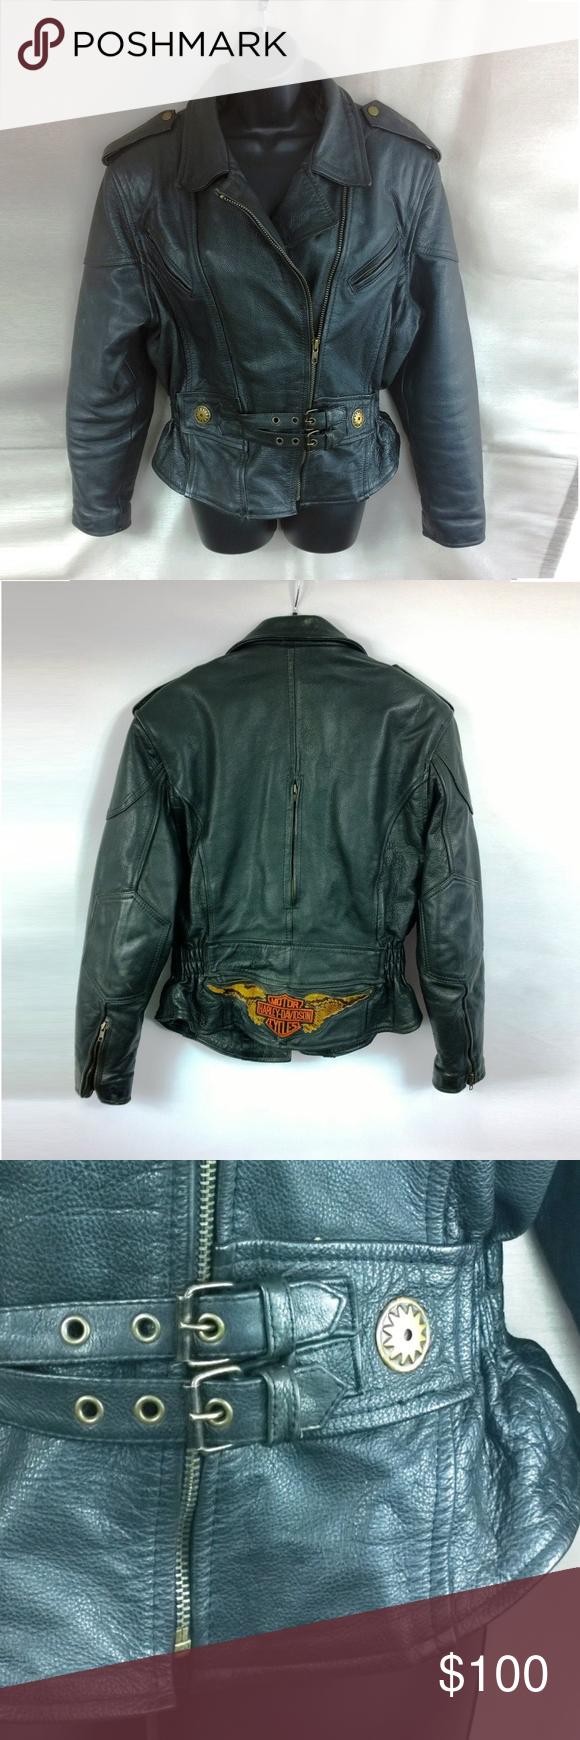 Harley Davidson Leather Motorcycle Jacket Authentic Harley